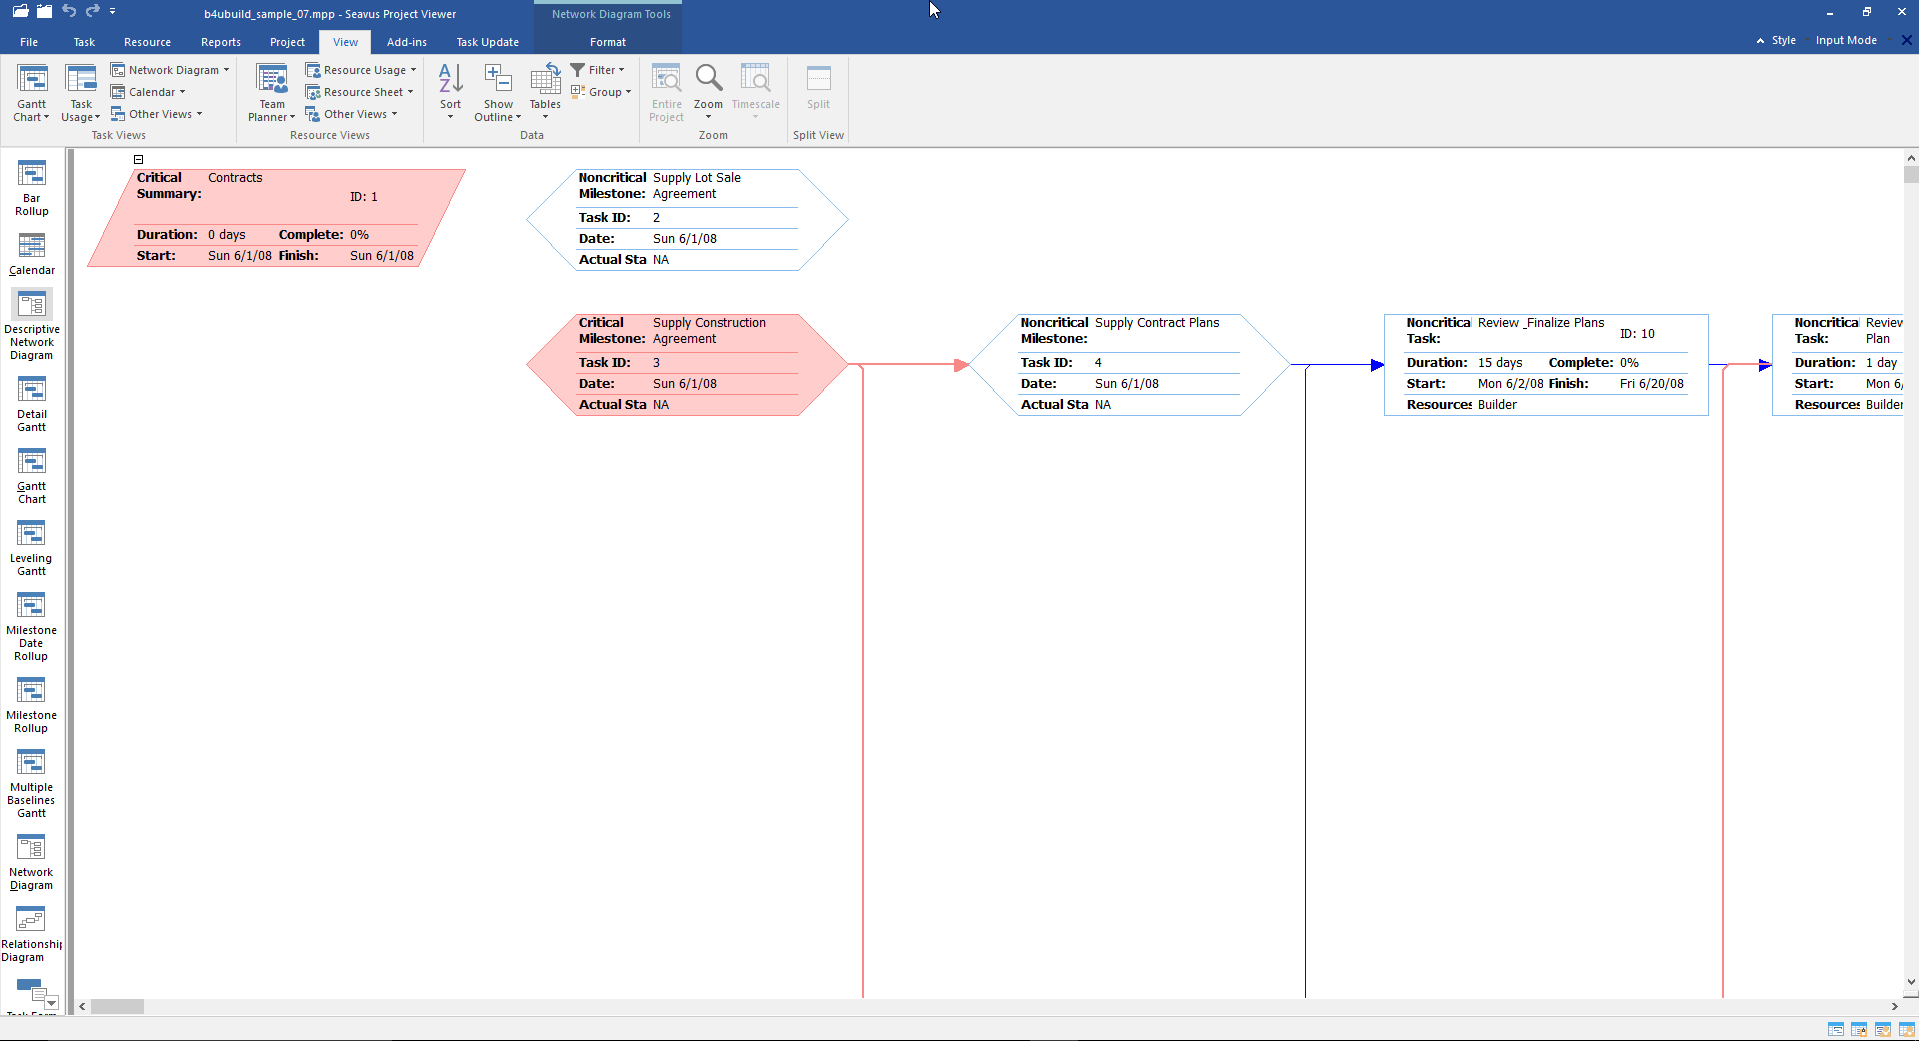 descriptive-network0diagram